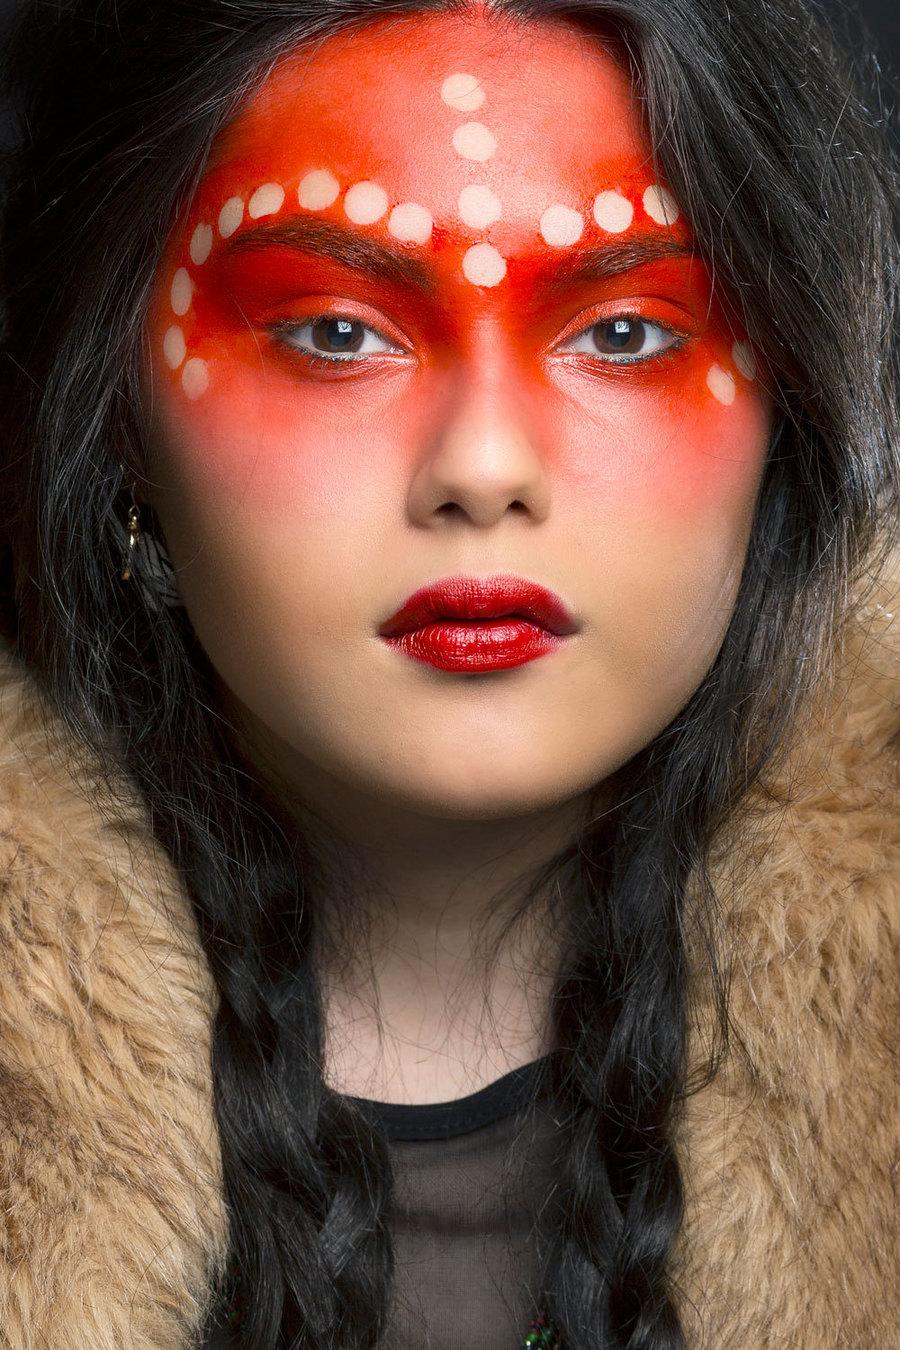 Tribal 2 / Photography by Brian Brogan, Model SafiaPixie, Taken at Brian Brogan / Uploaded 24th May 2017 @ 07:29 PM